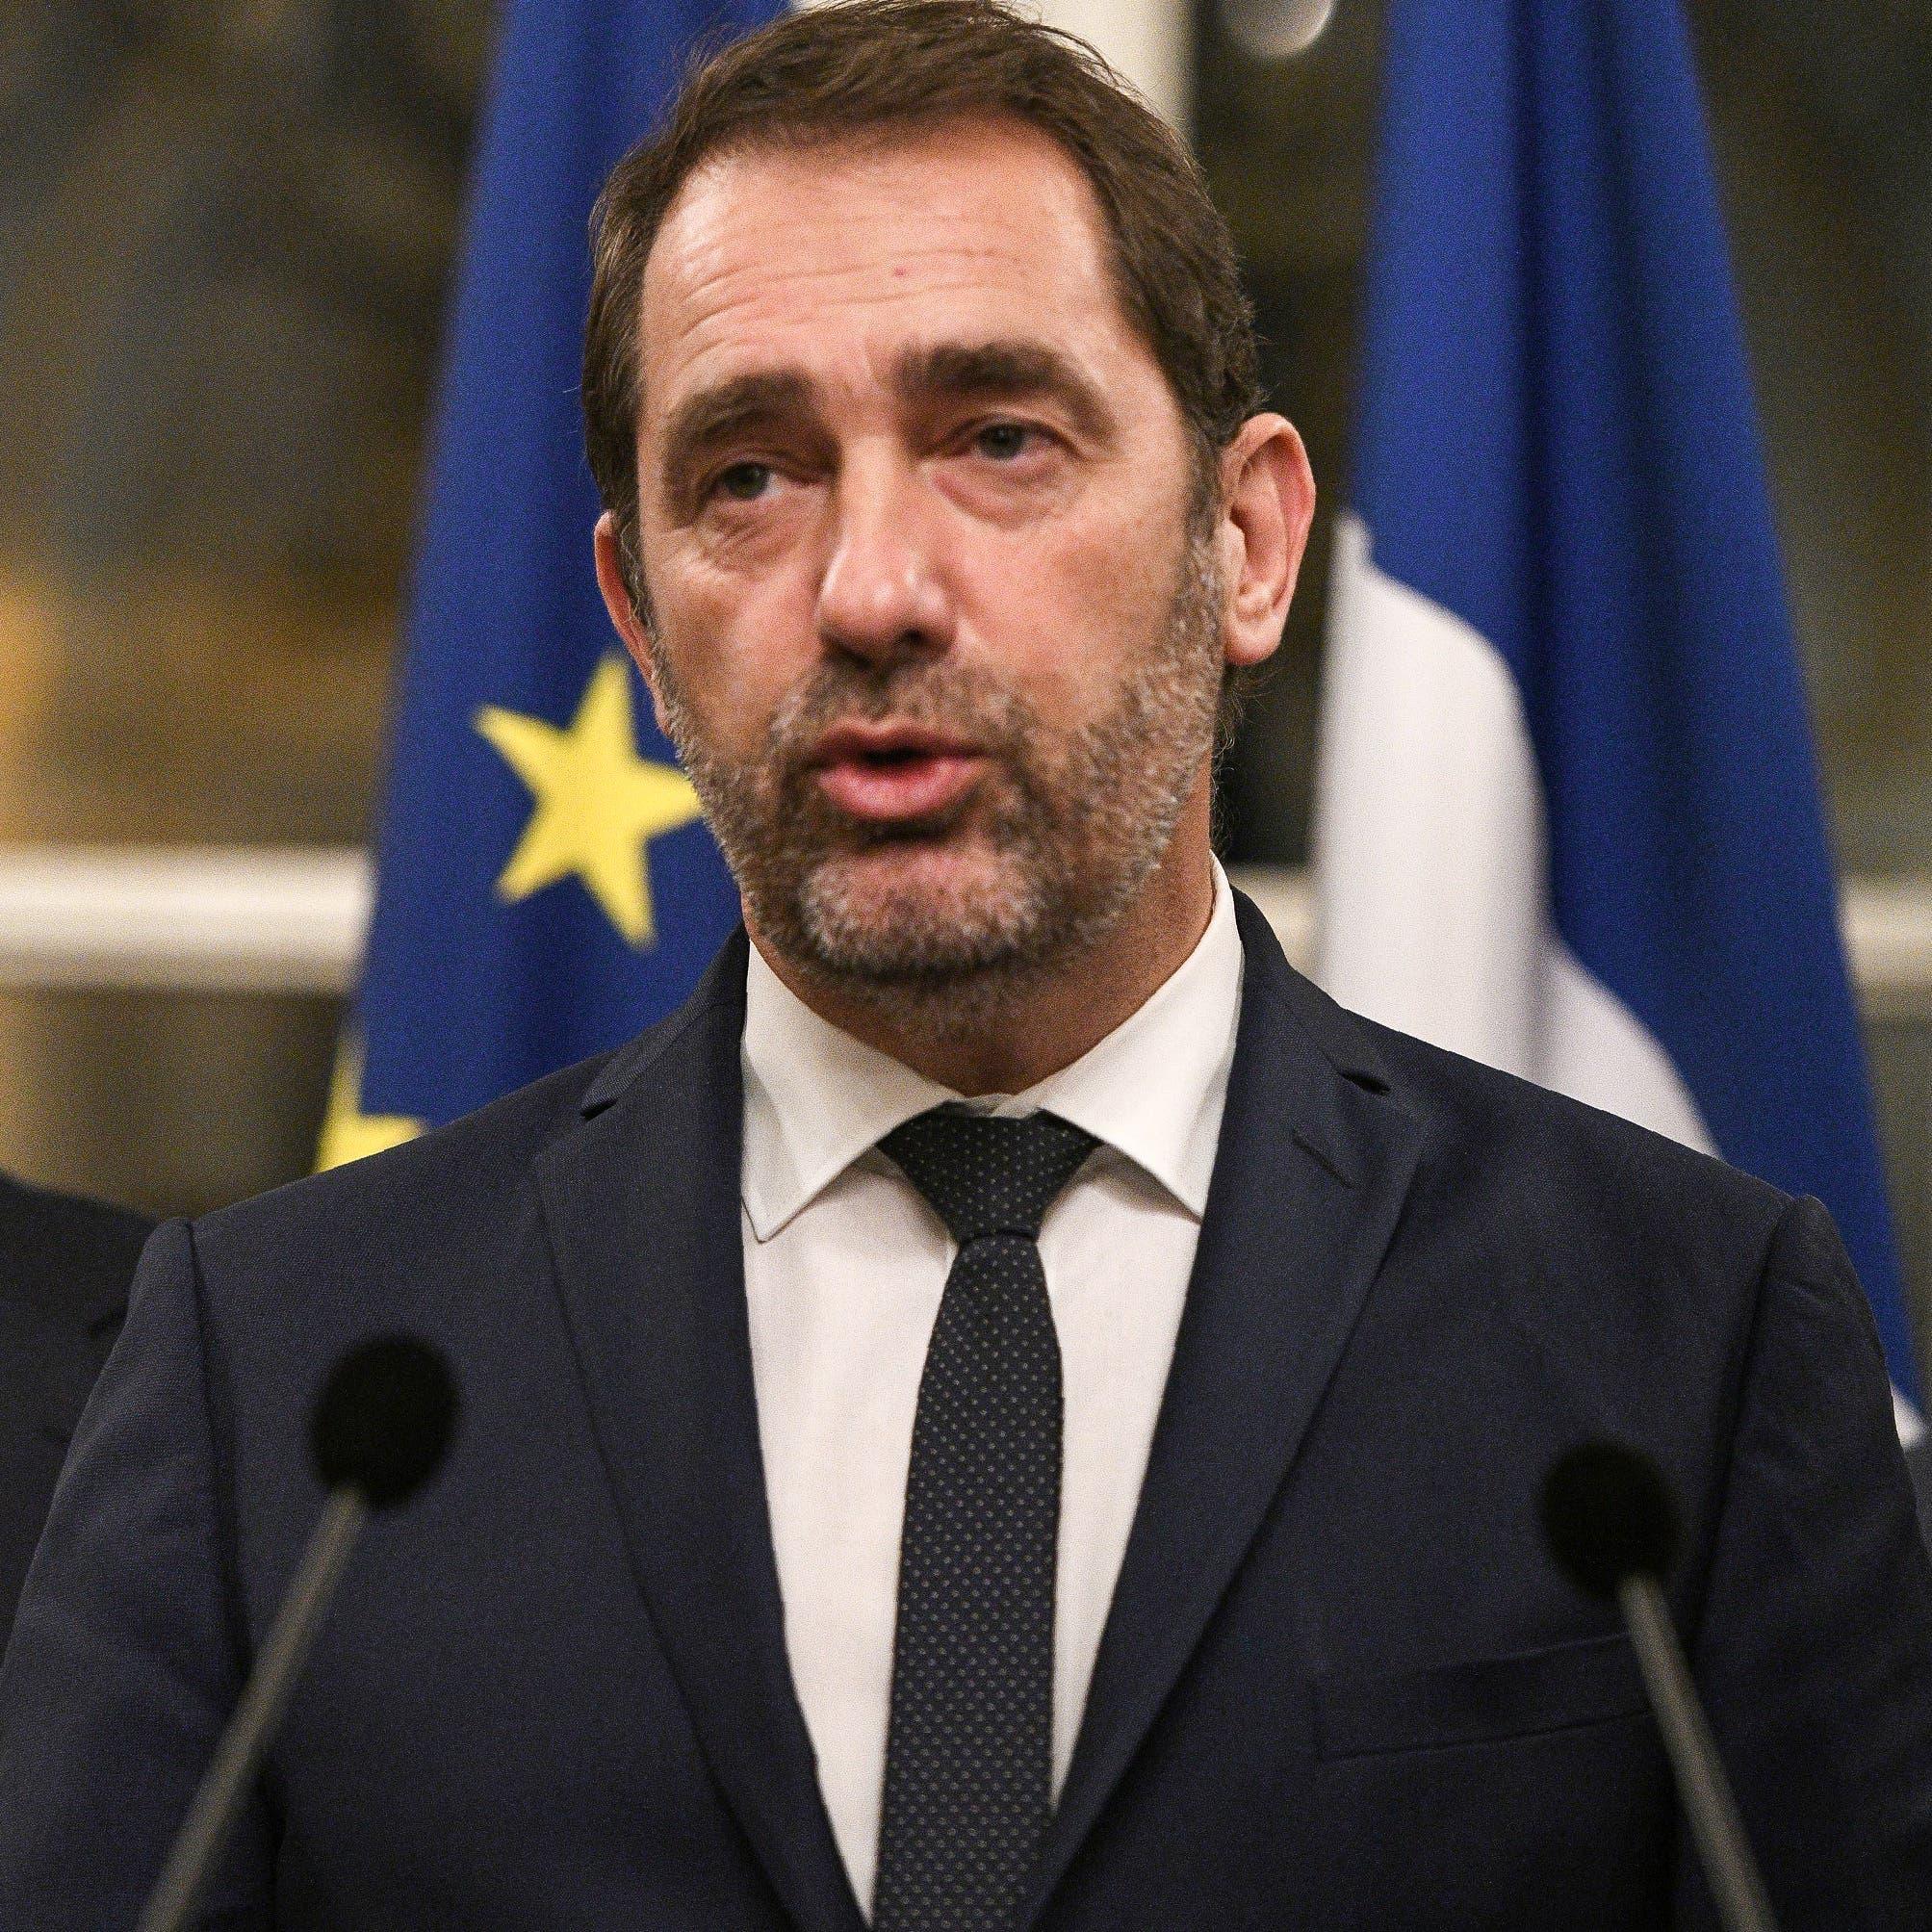 فرنسا: مهاجم ستراسبورغ طليق وقوات خاصة تلاحقه